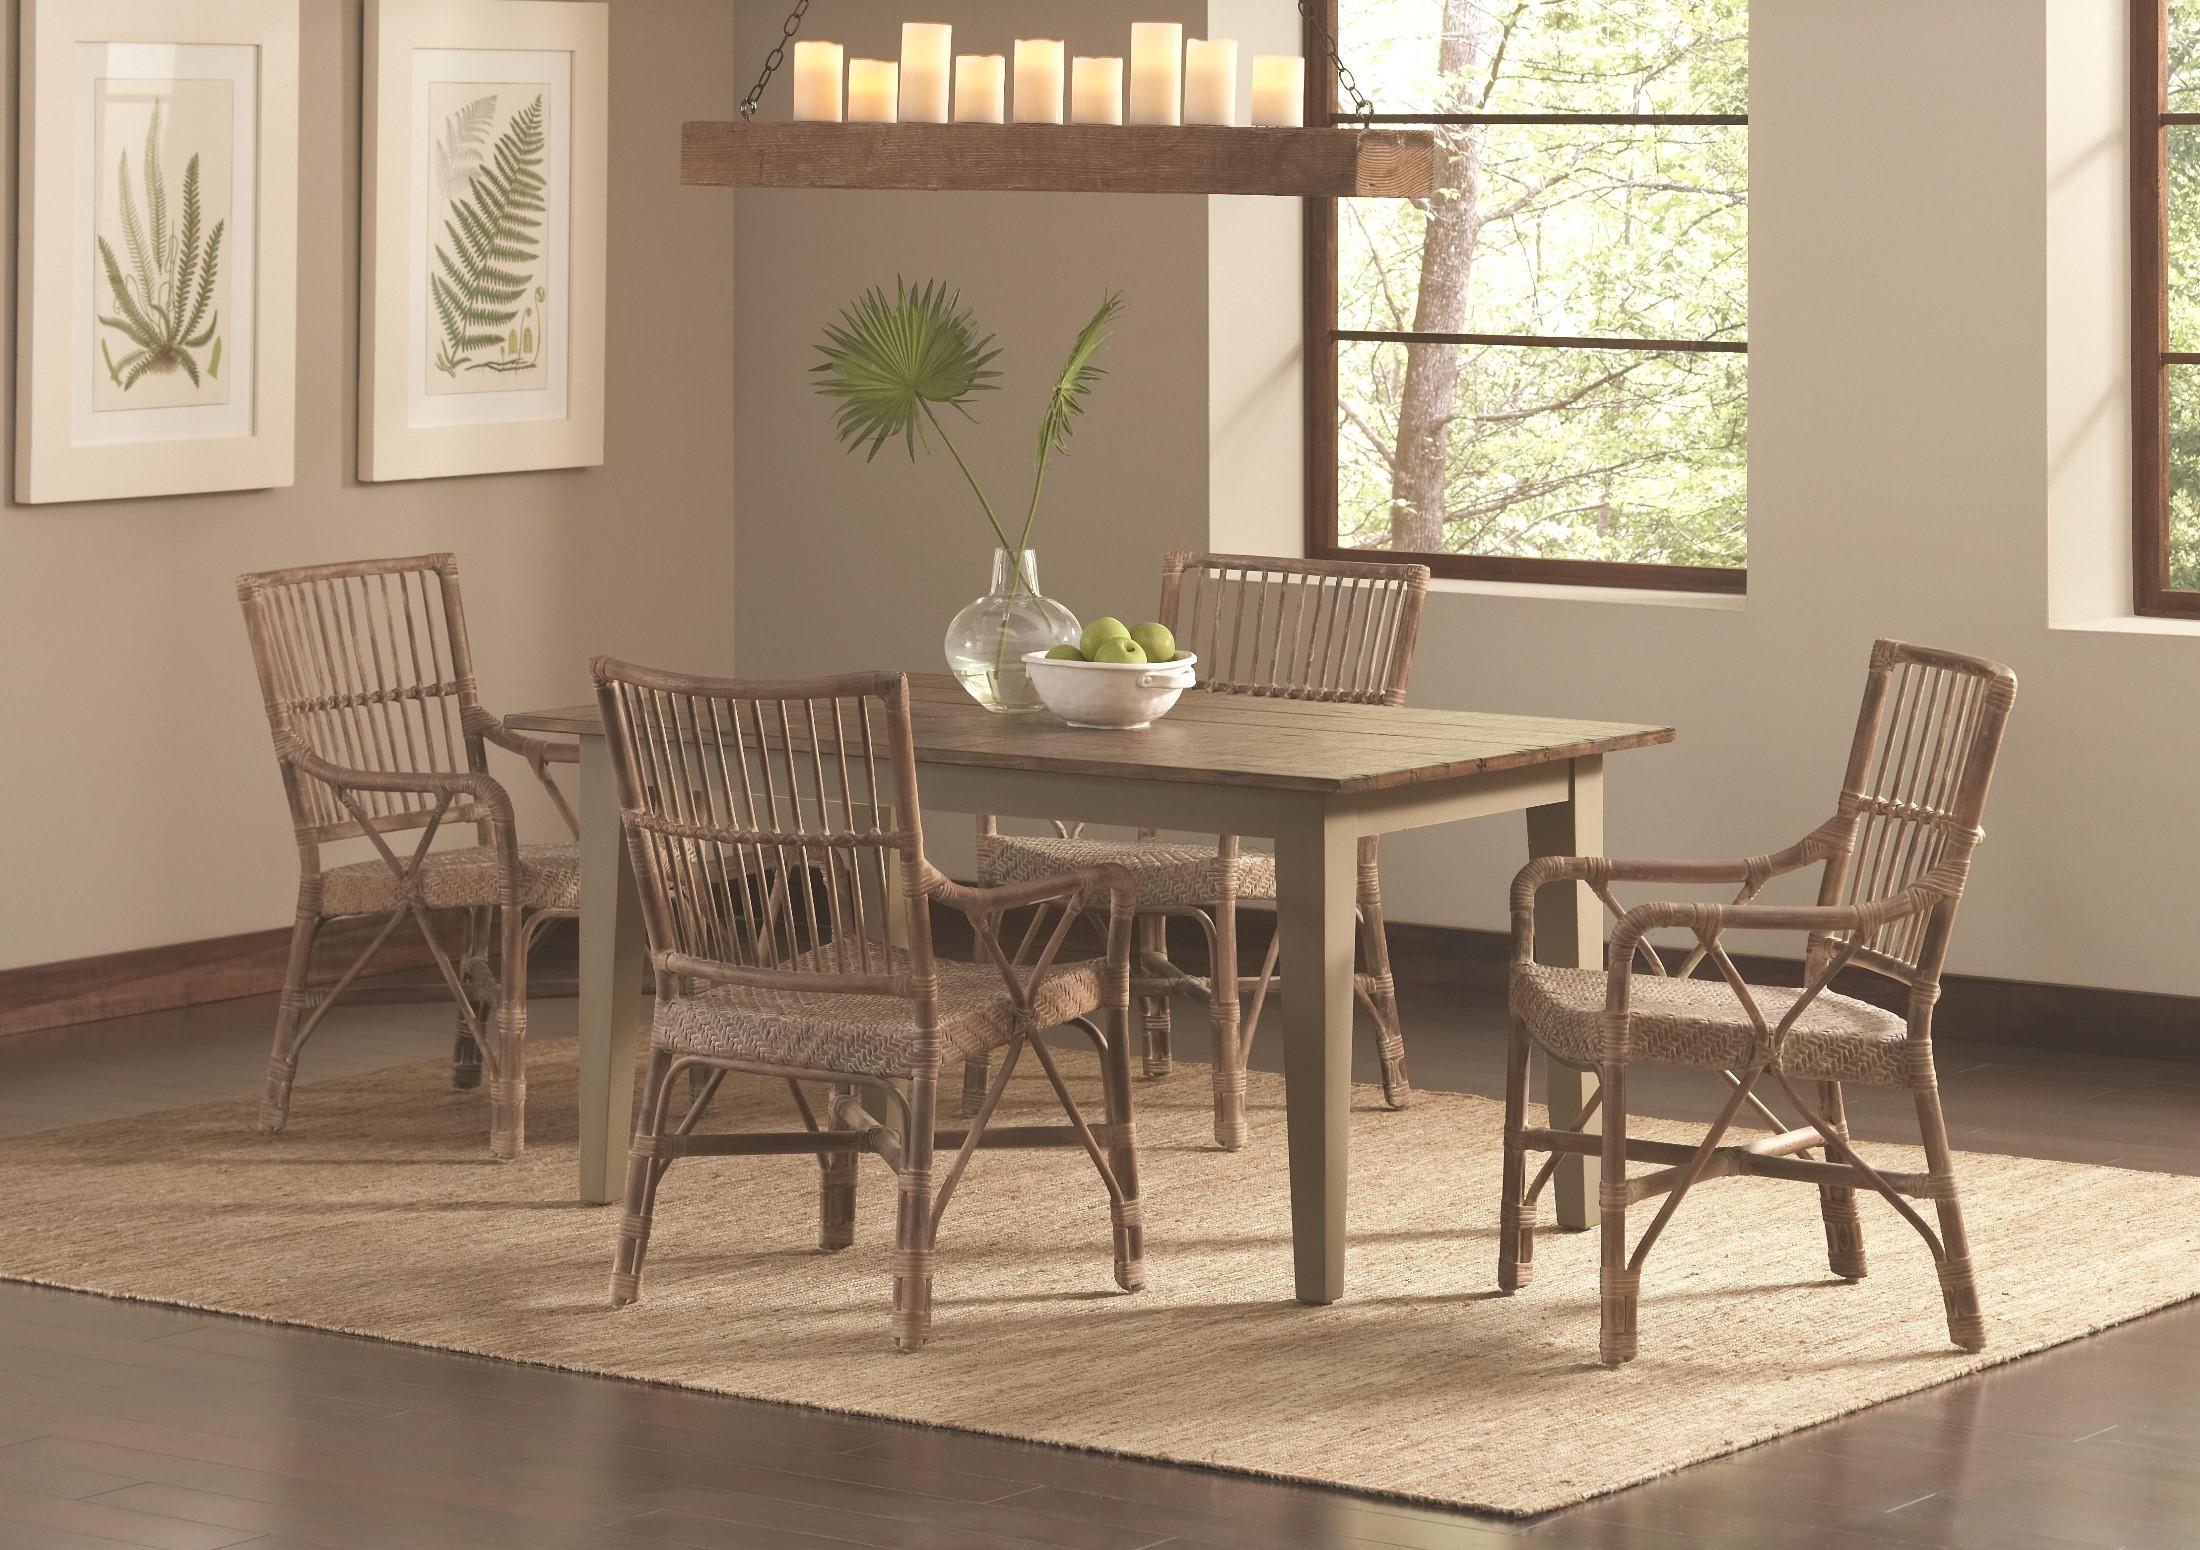 south rectangular dining room set d684 31 largo